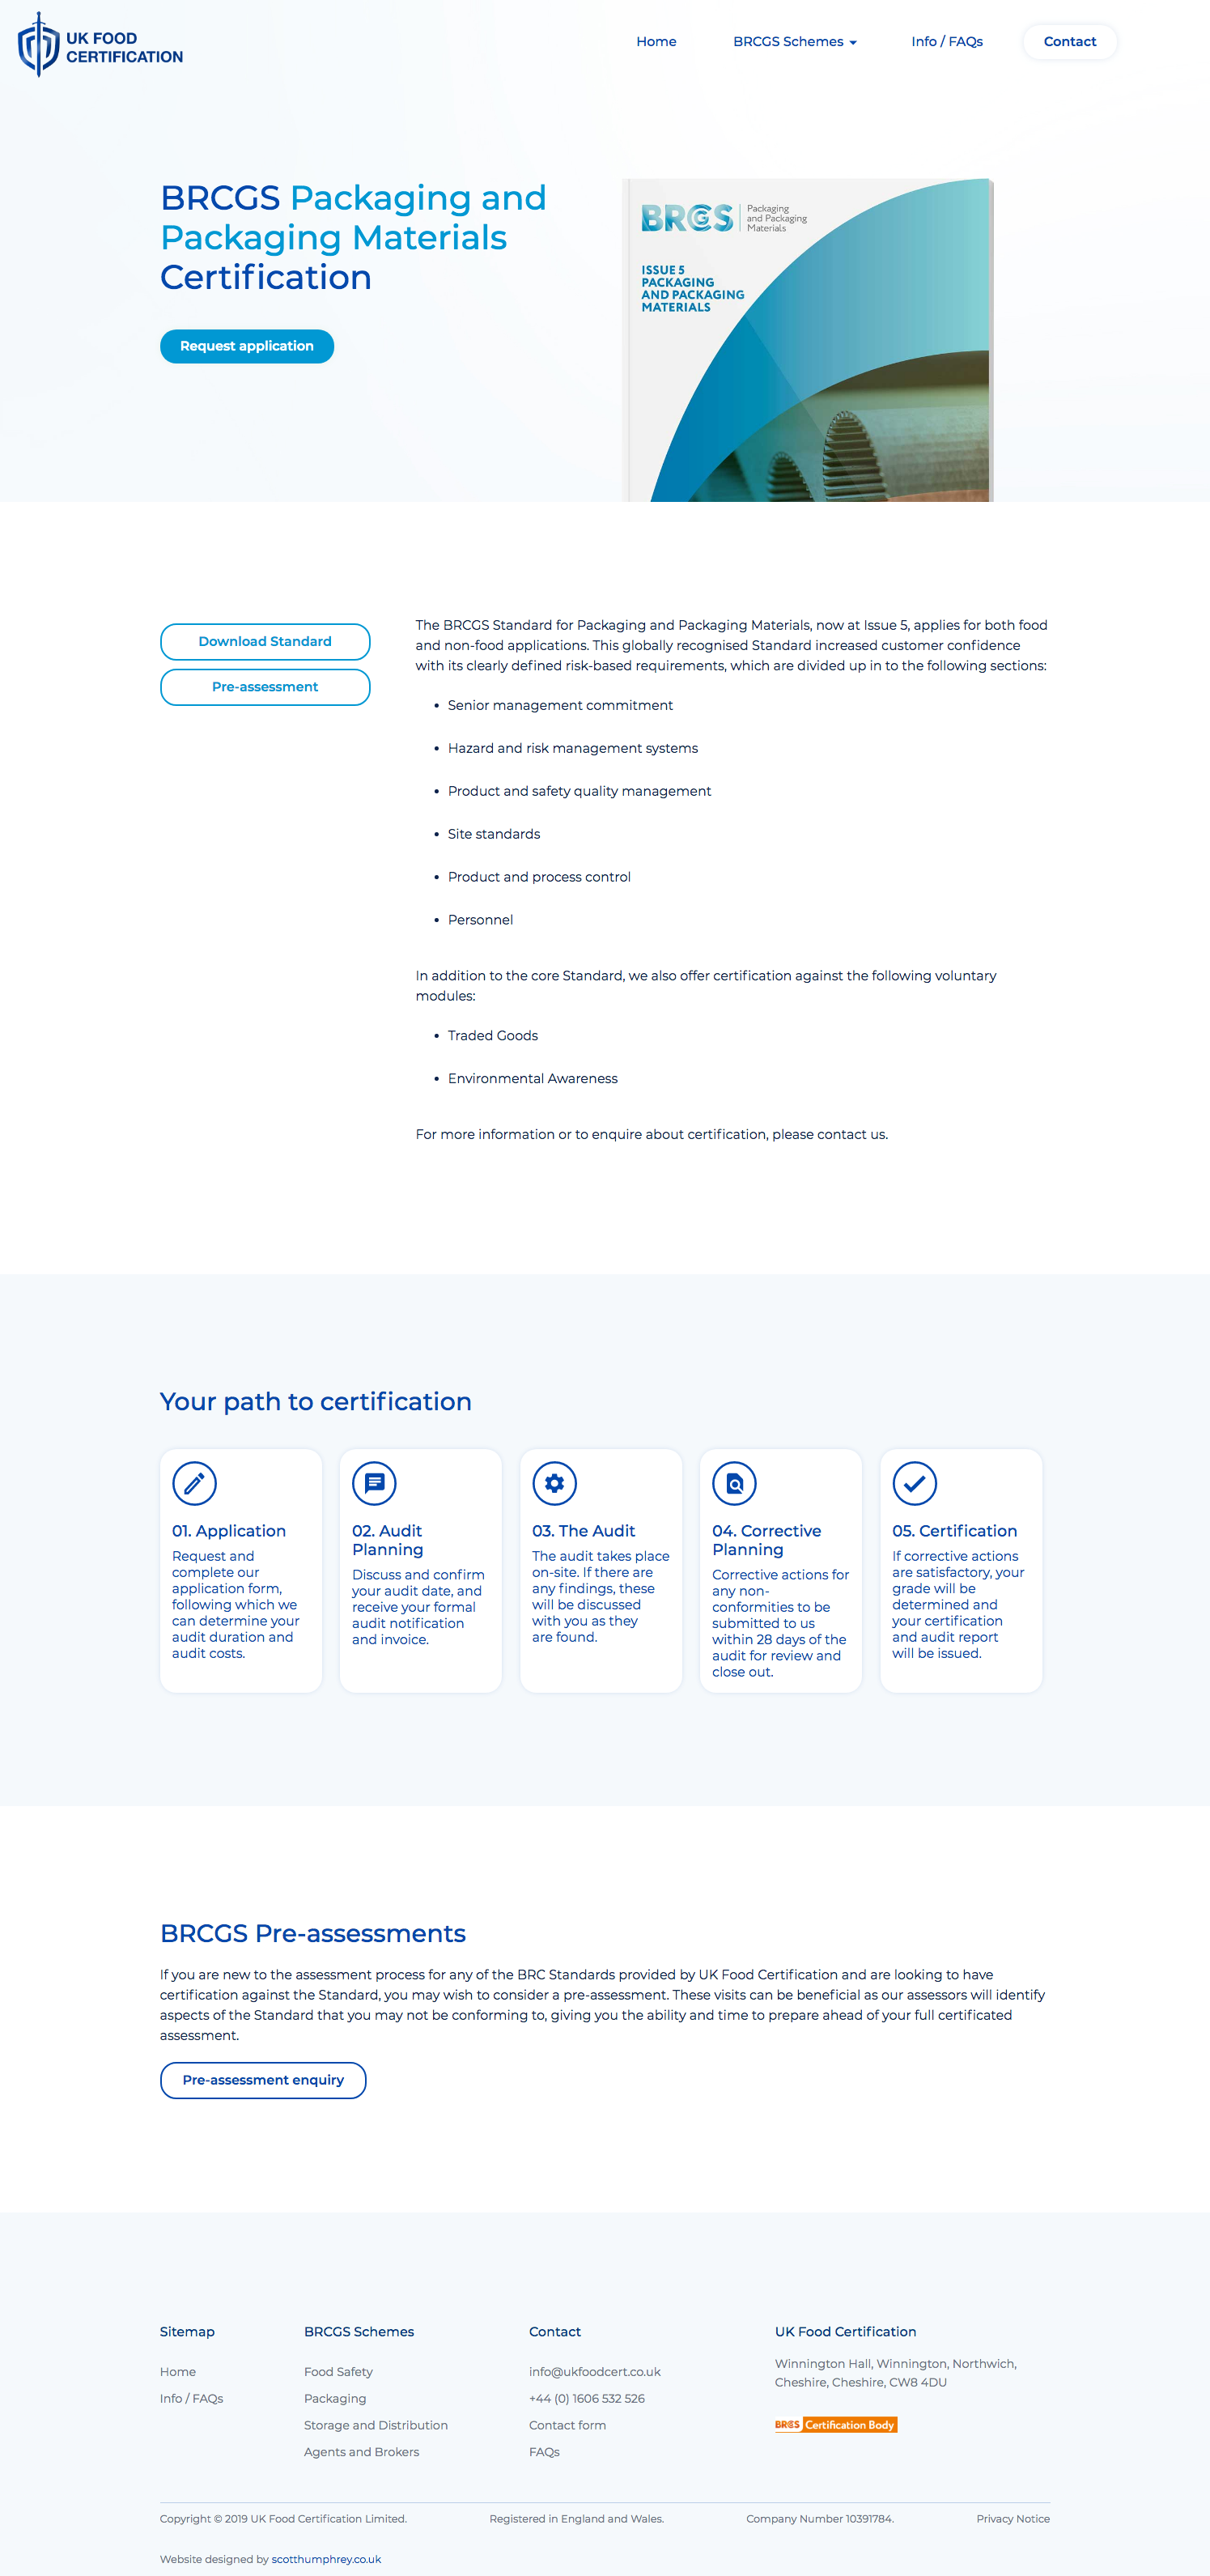 ukfoodcert-webdesign-image2